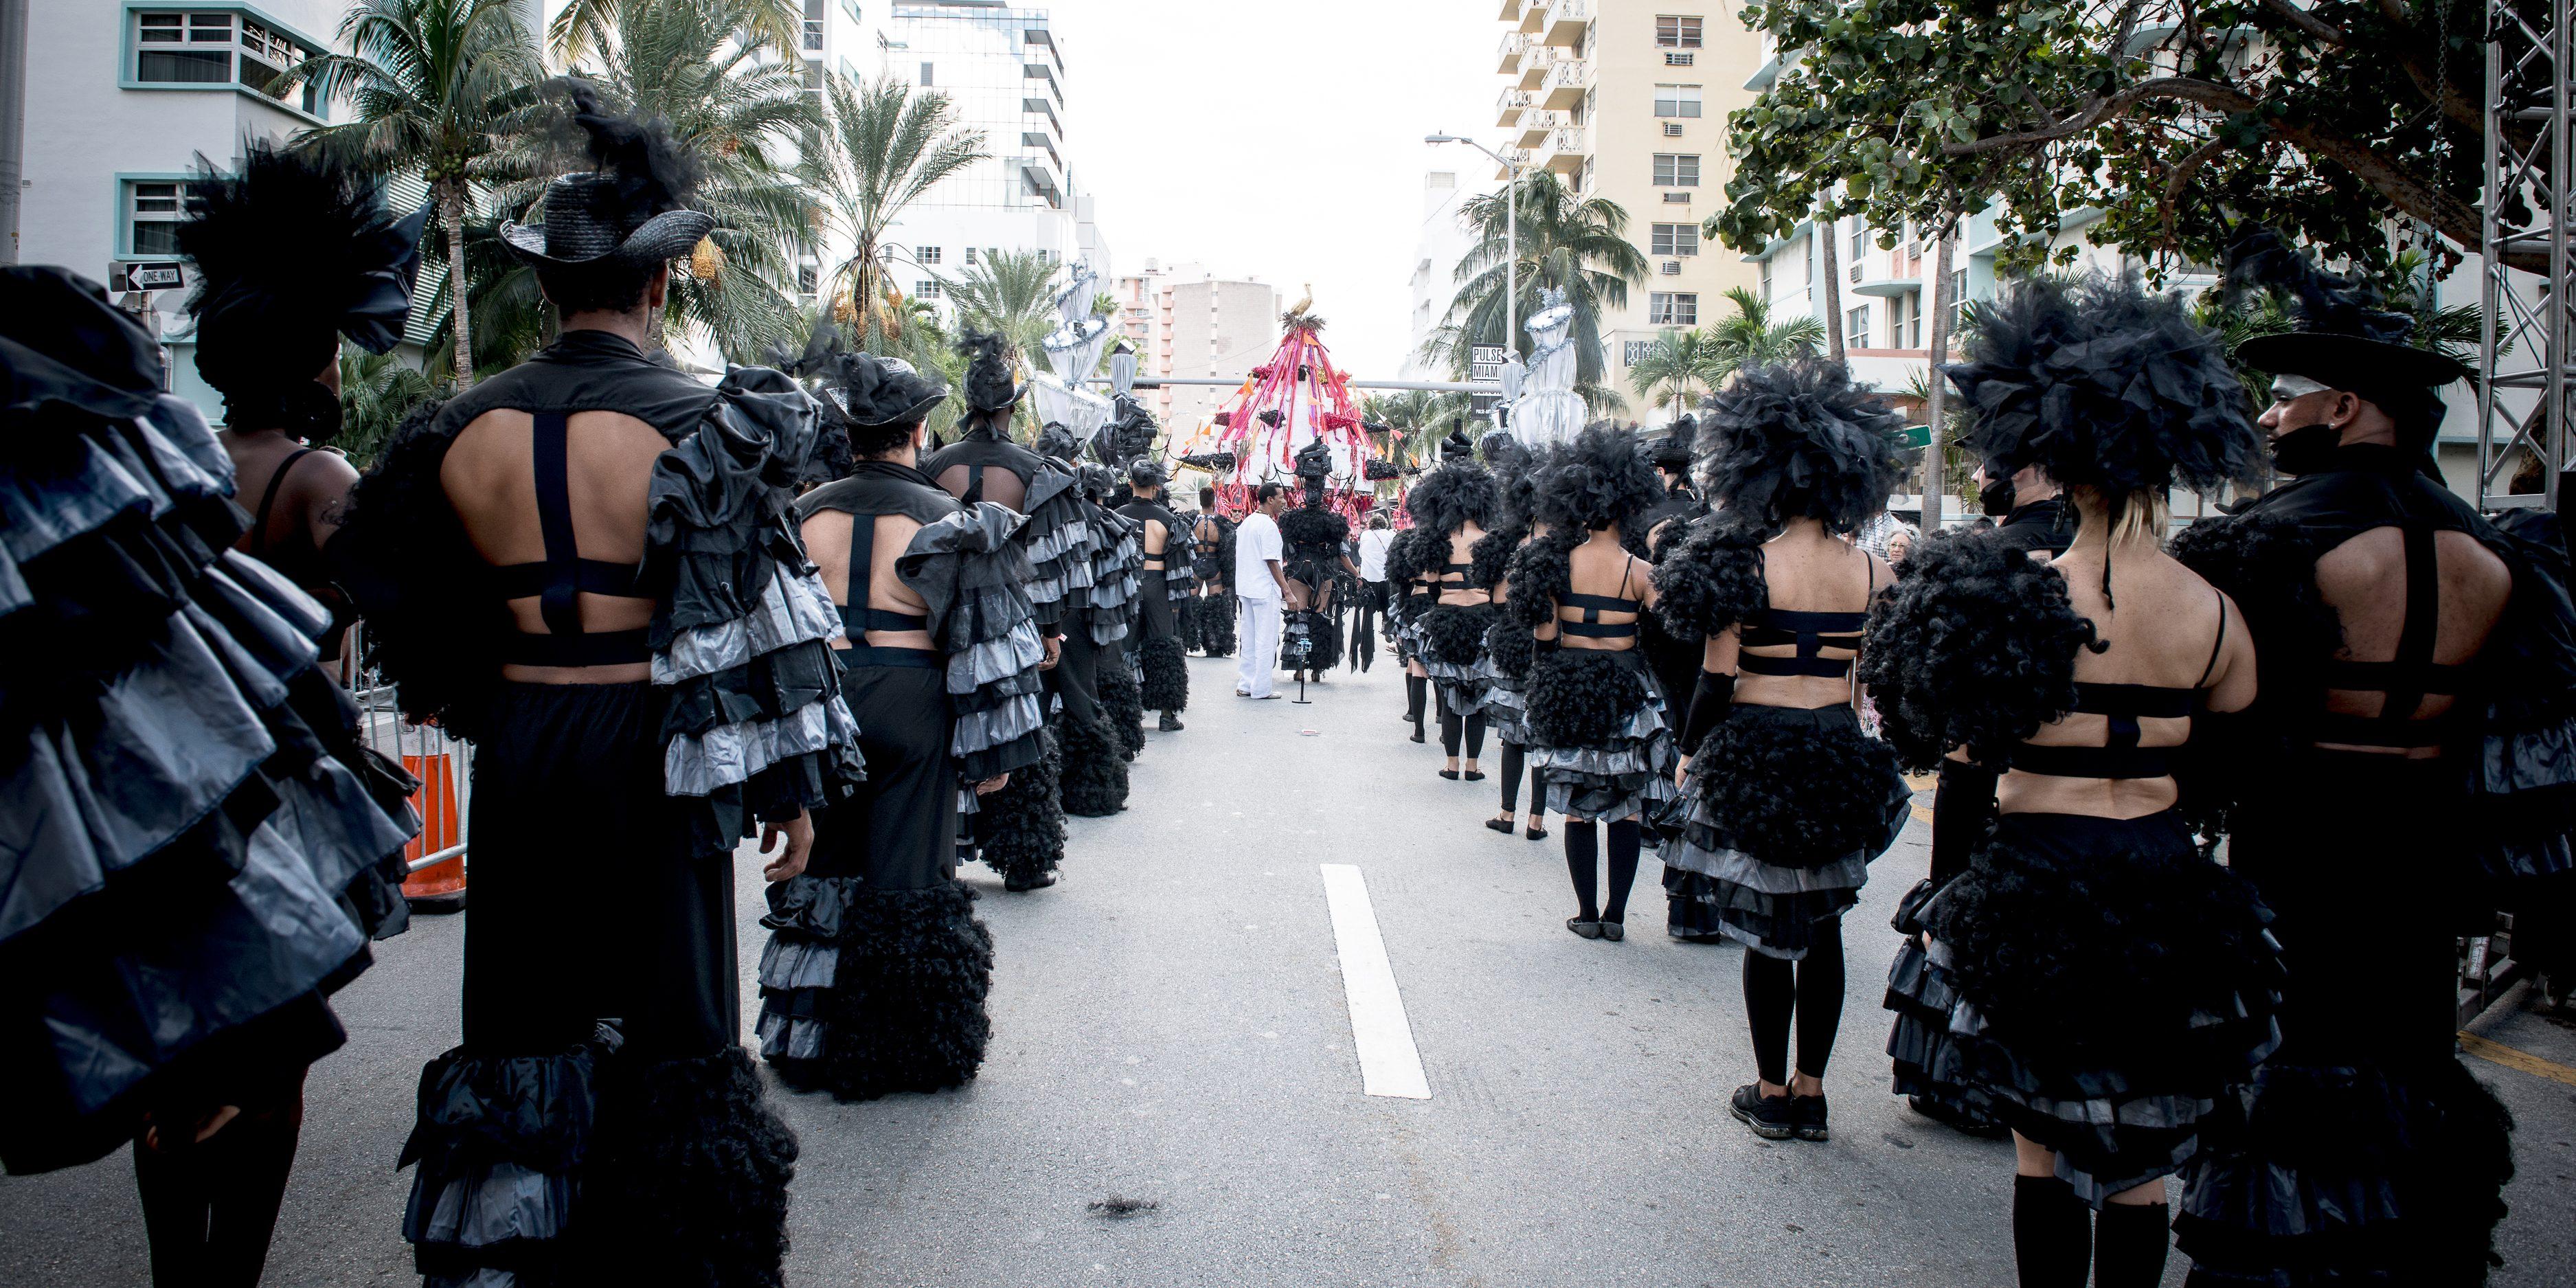 Los Carpinteros, Conga Irreversible. Photo Jorge Miño, courtesy Faena Art